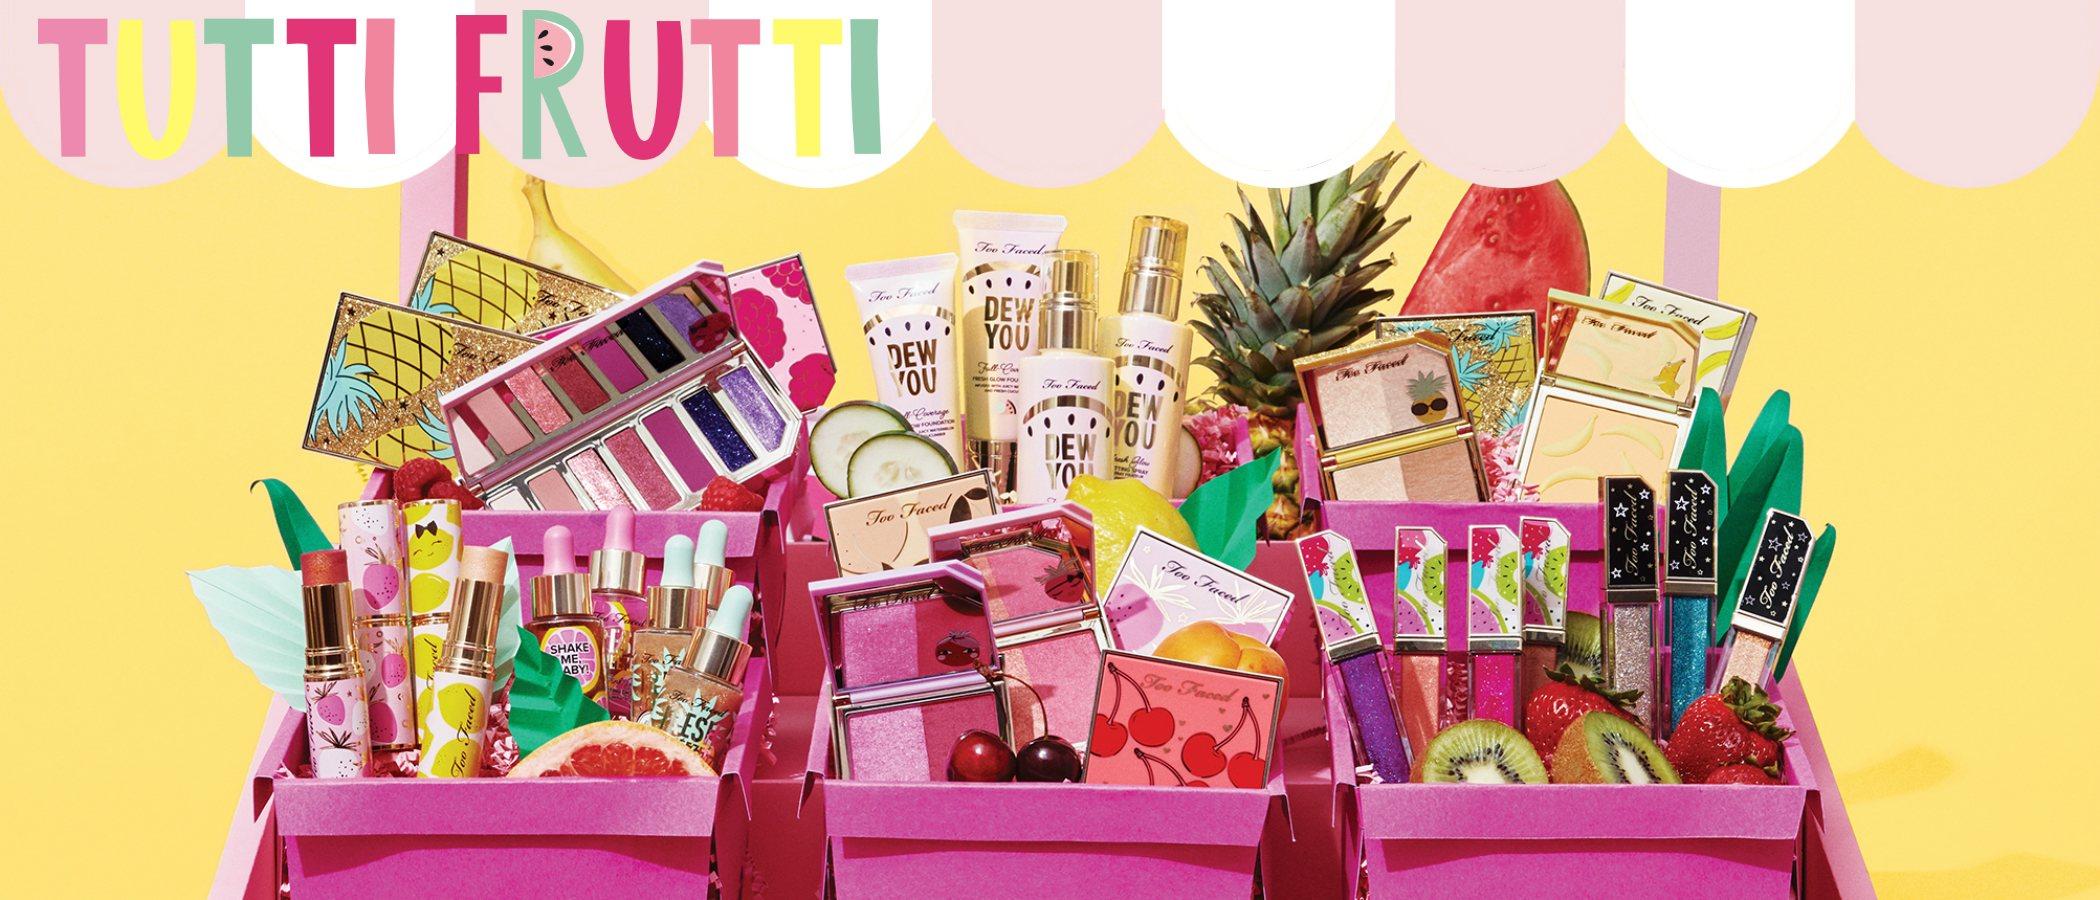 'Tutti Frutti', la deliciosa colección de maquillaje de Too Faced